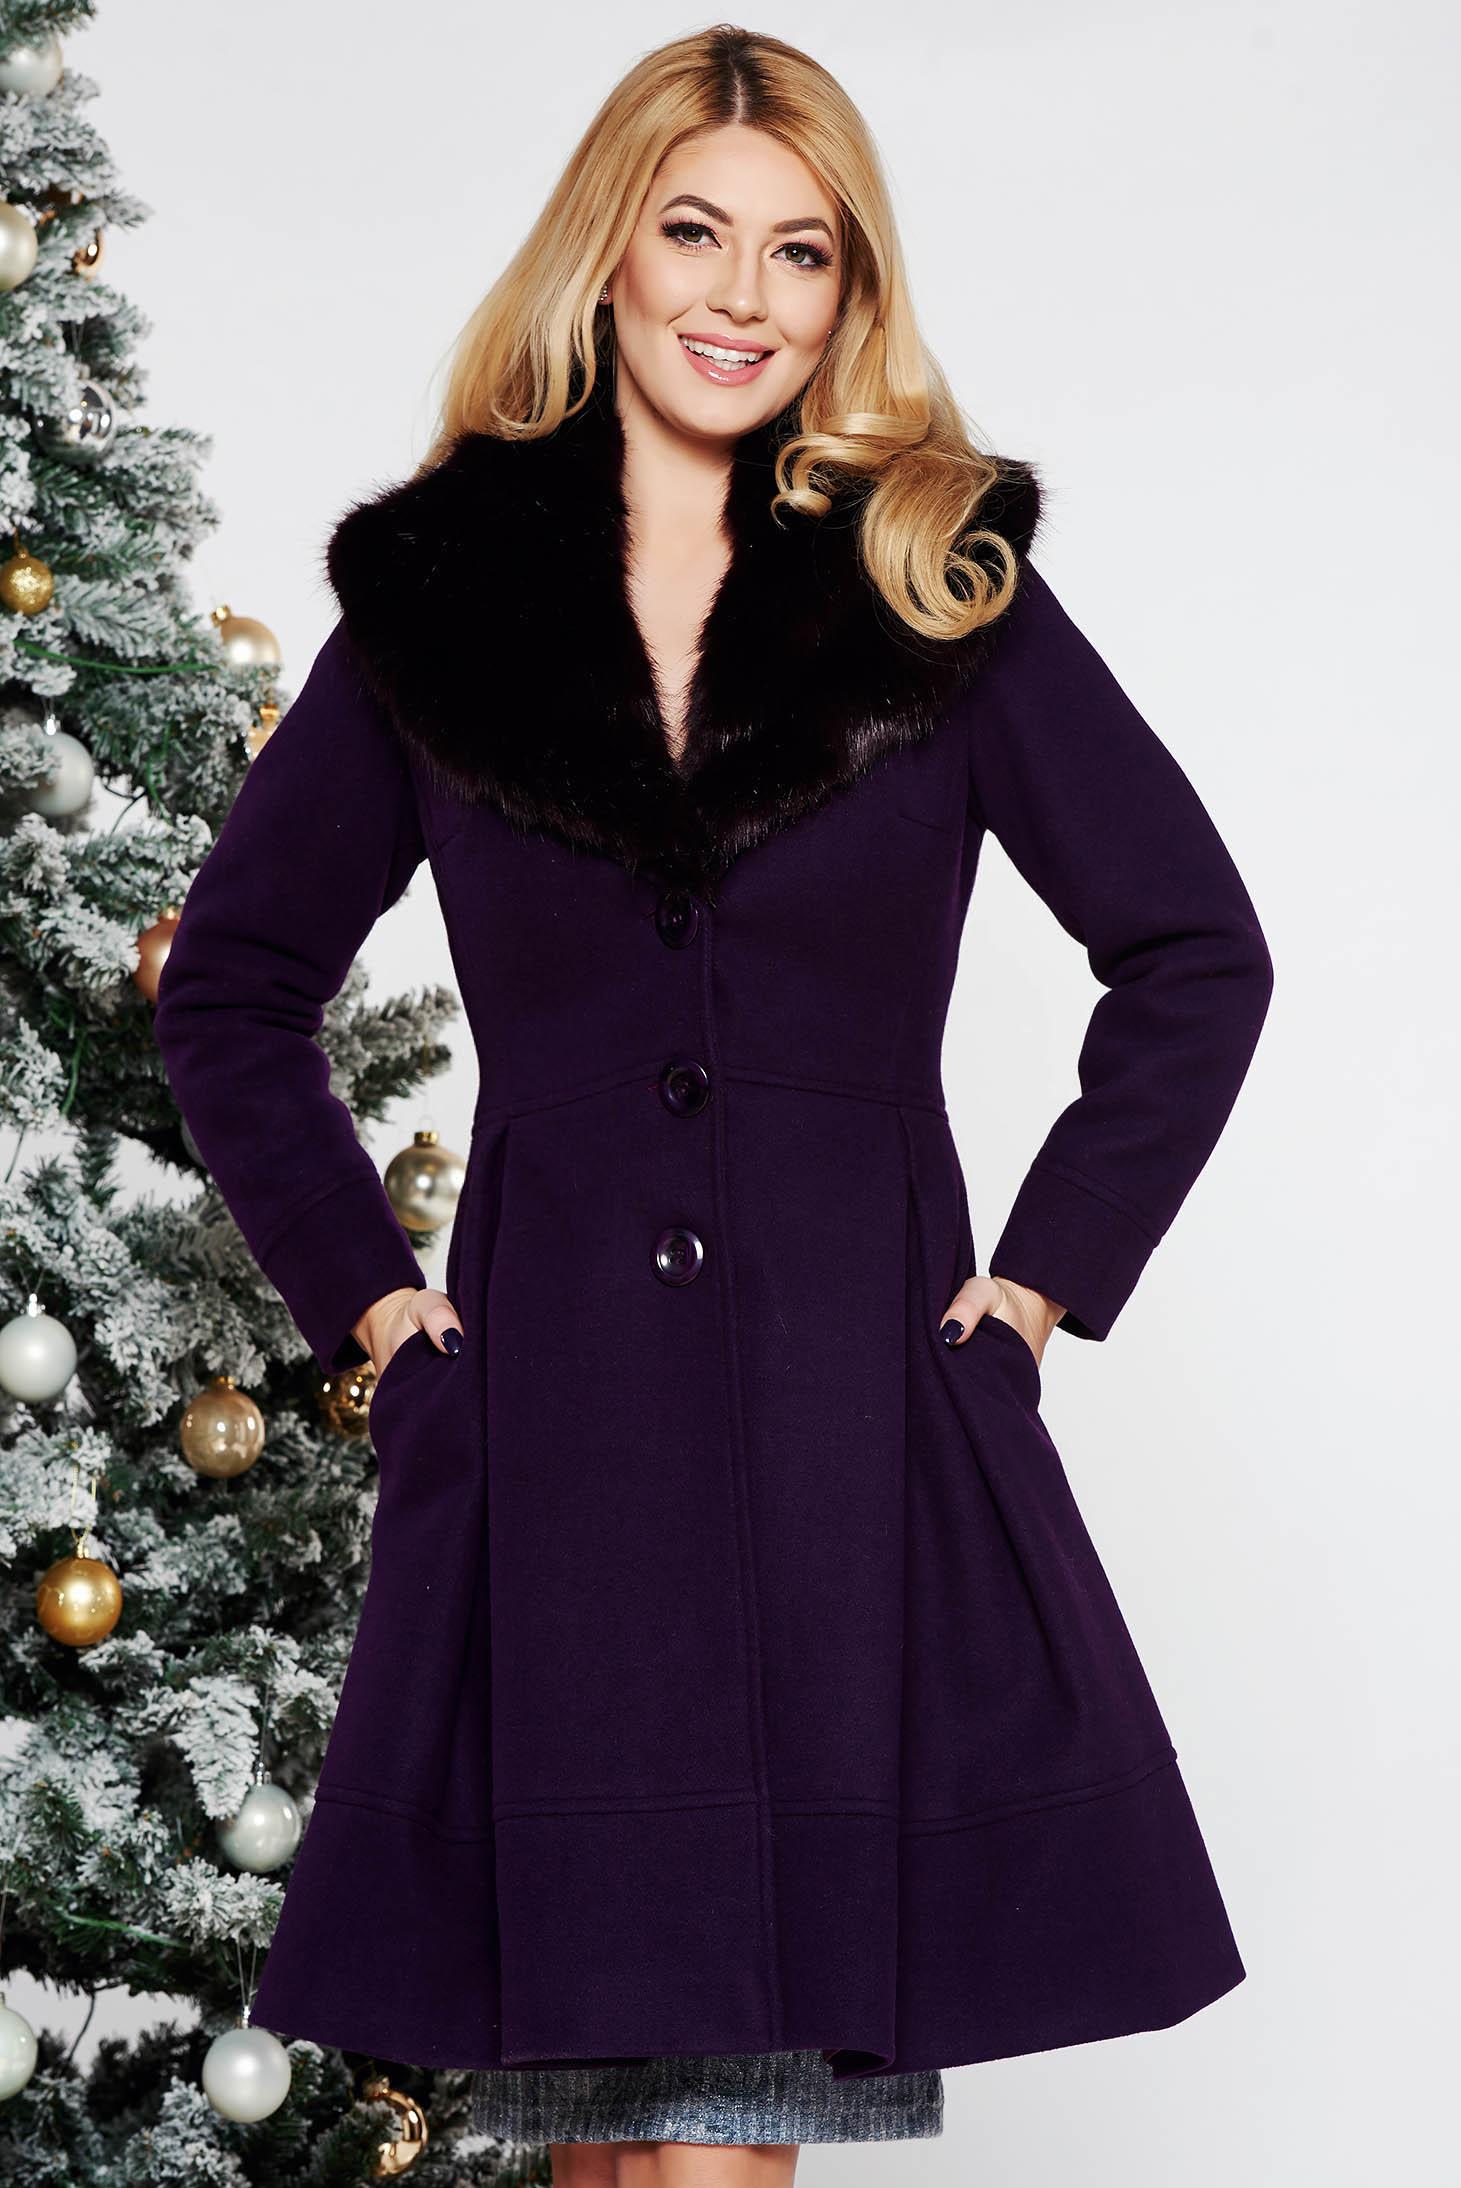 Palton LaDonna mov elegant in clos din lana cu insertii de blana ecologica detasabile